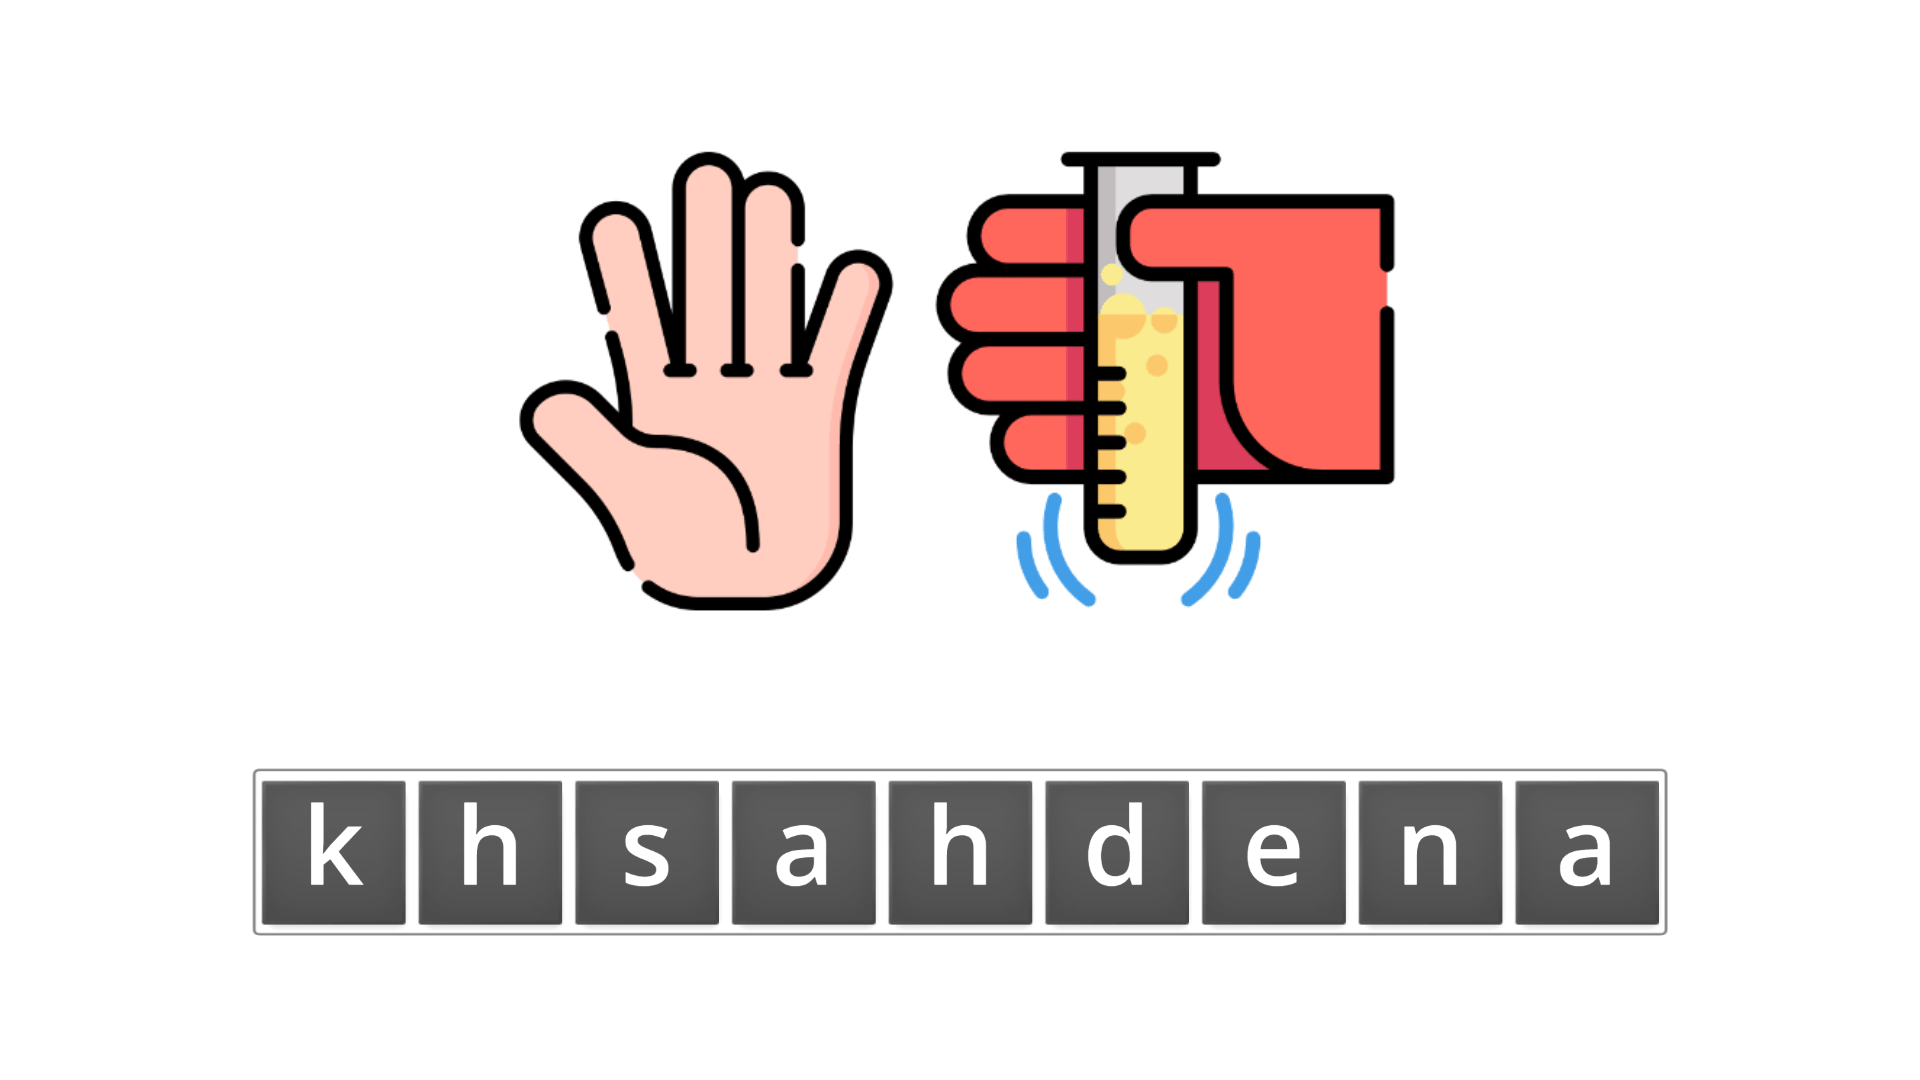 esl resources - flashcards - compound nouns - unscramble - handshake